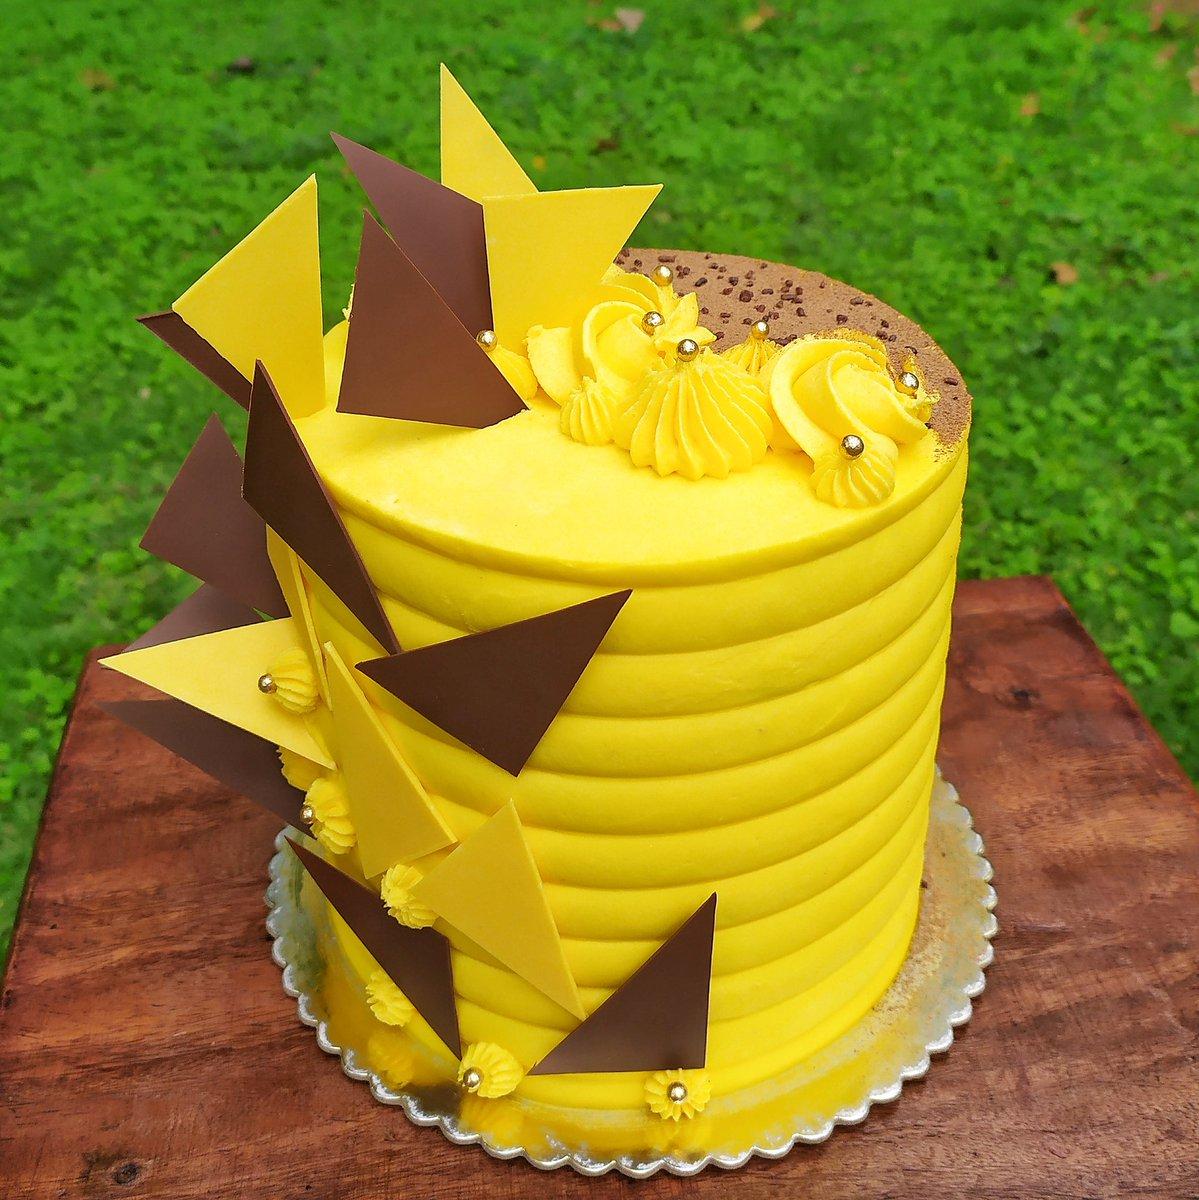 TallCake Parchita . . #cassadulce #parchita #maracuya #cake #postres #torta #dulces #smile #happy  #cumana #cumaná #venezuela https://t.co/MM70GjPaXE